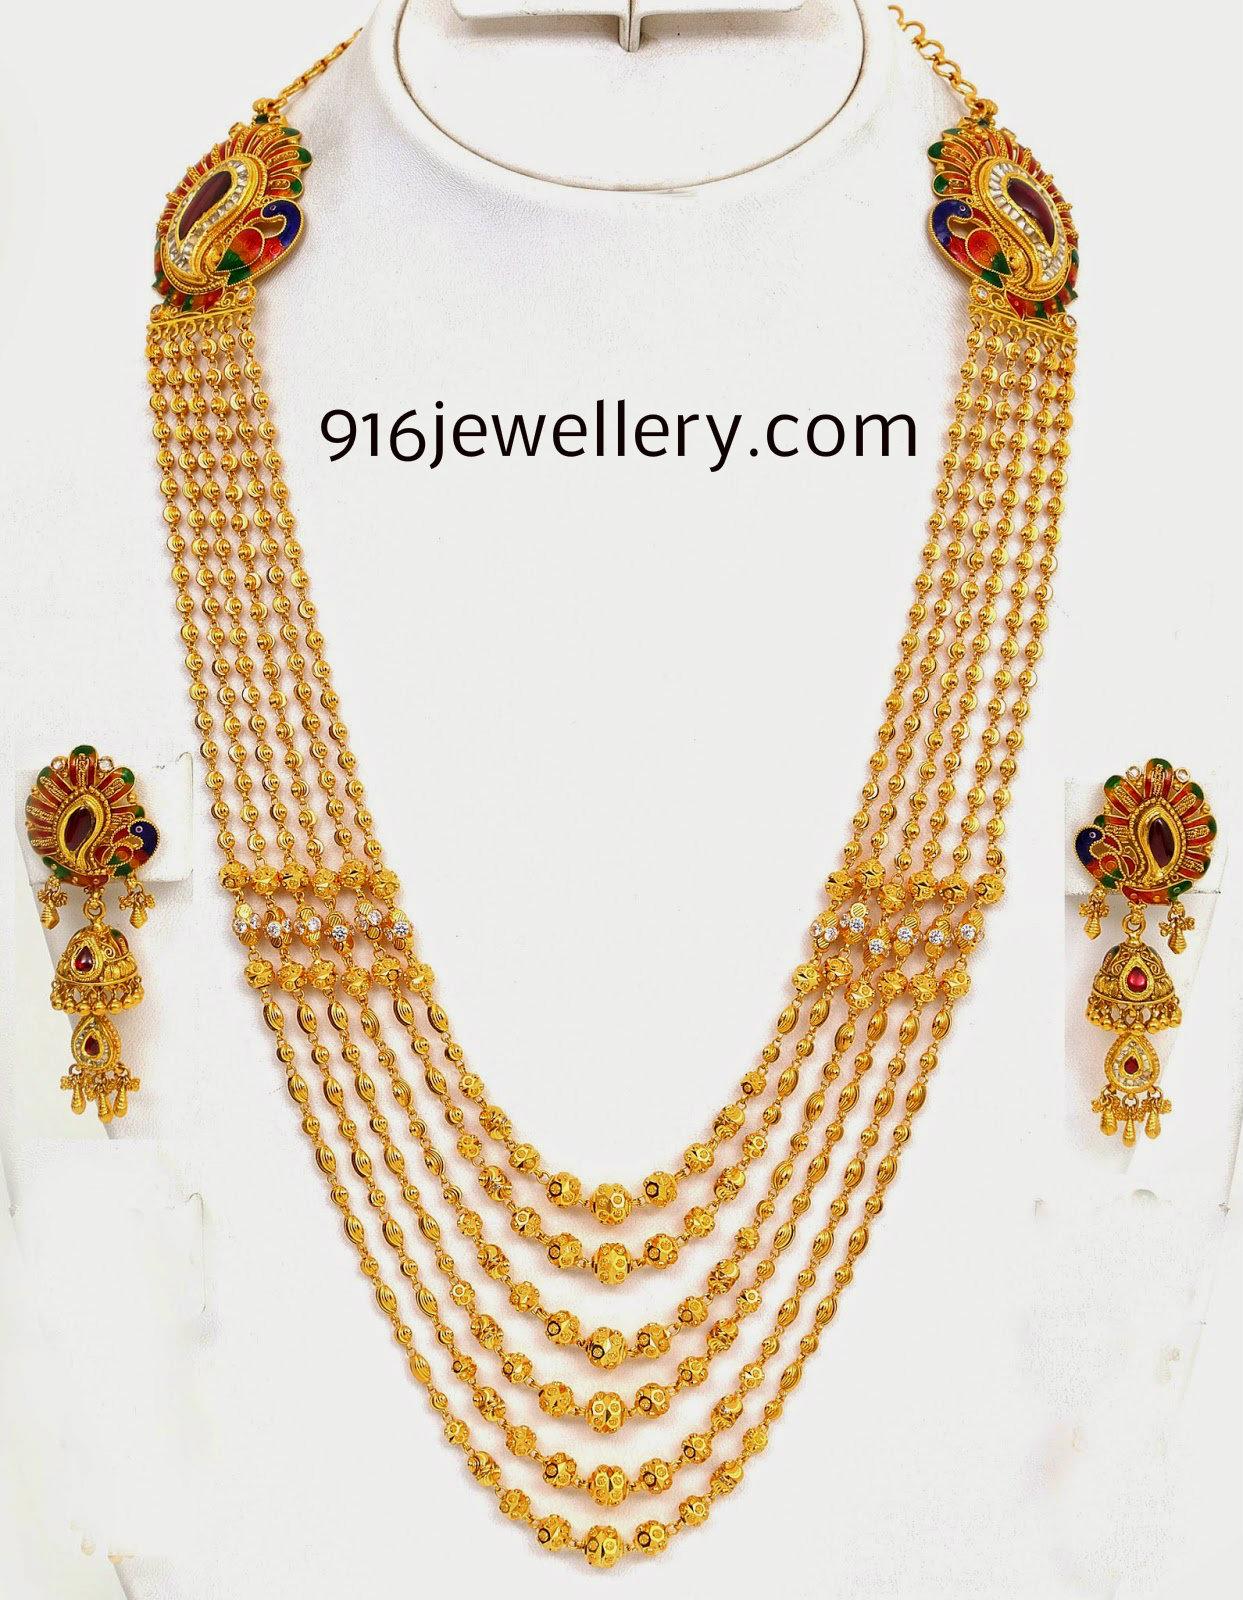 Best Of 916 Gold Jewellery Designs   Jewellry\'s Website